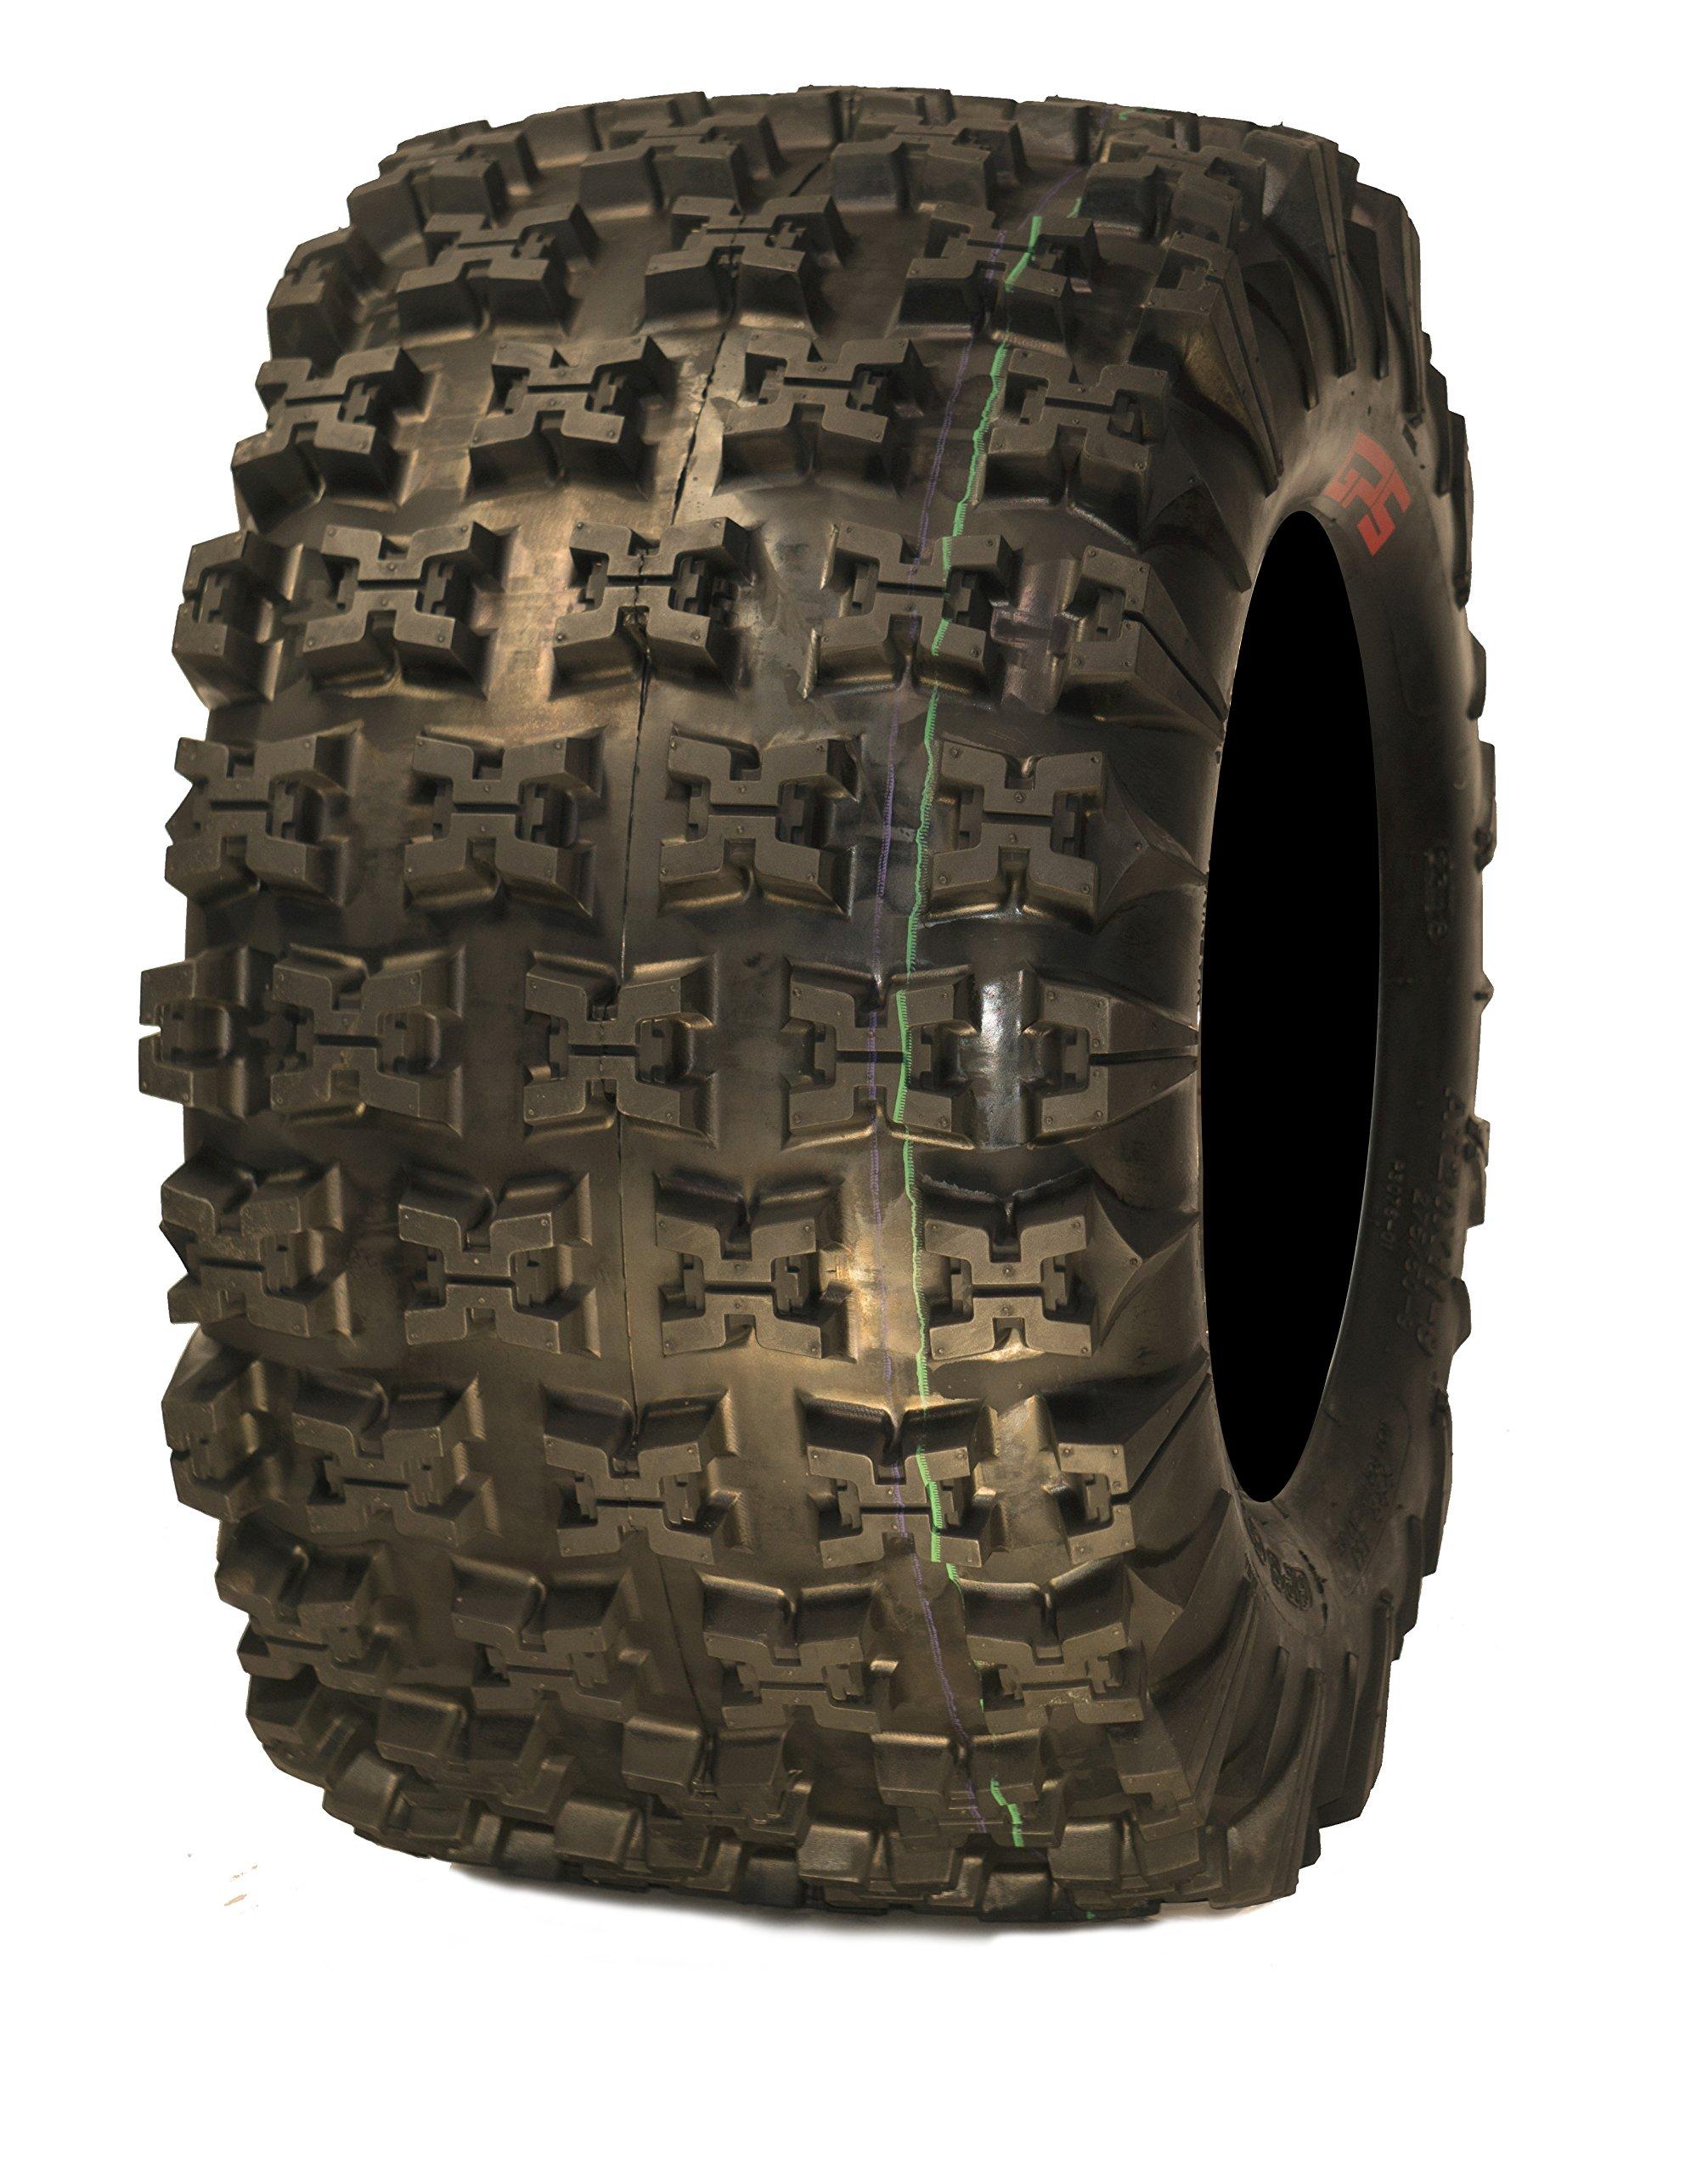 20x11-9 GPS Gravity 655 Atv Rear Tire, 6 Ply, Durable Sport Tire, XC, GNCC